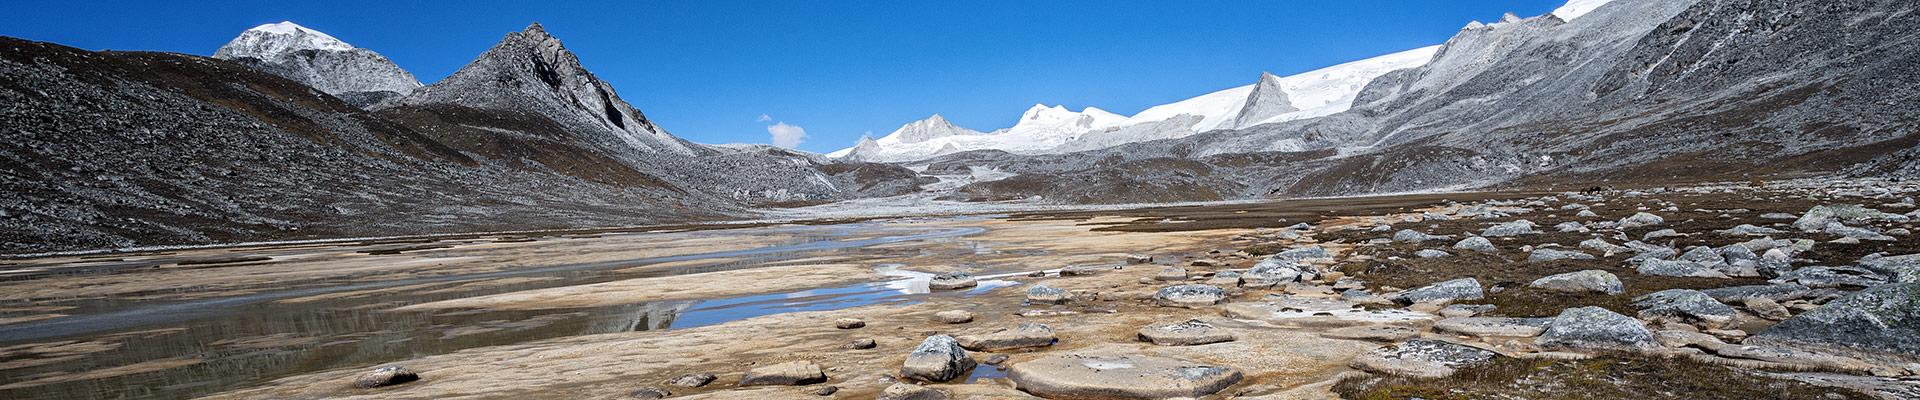 Top image montagnes Snowman Trek